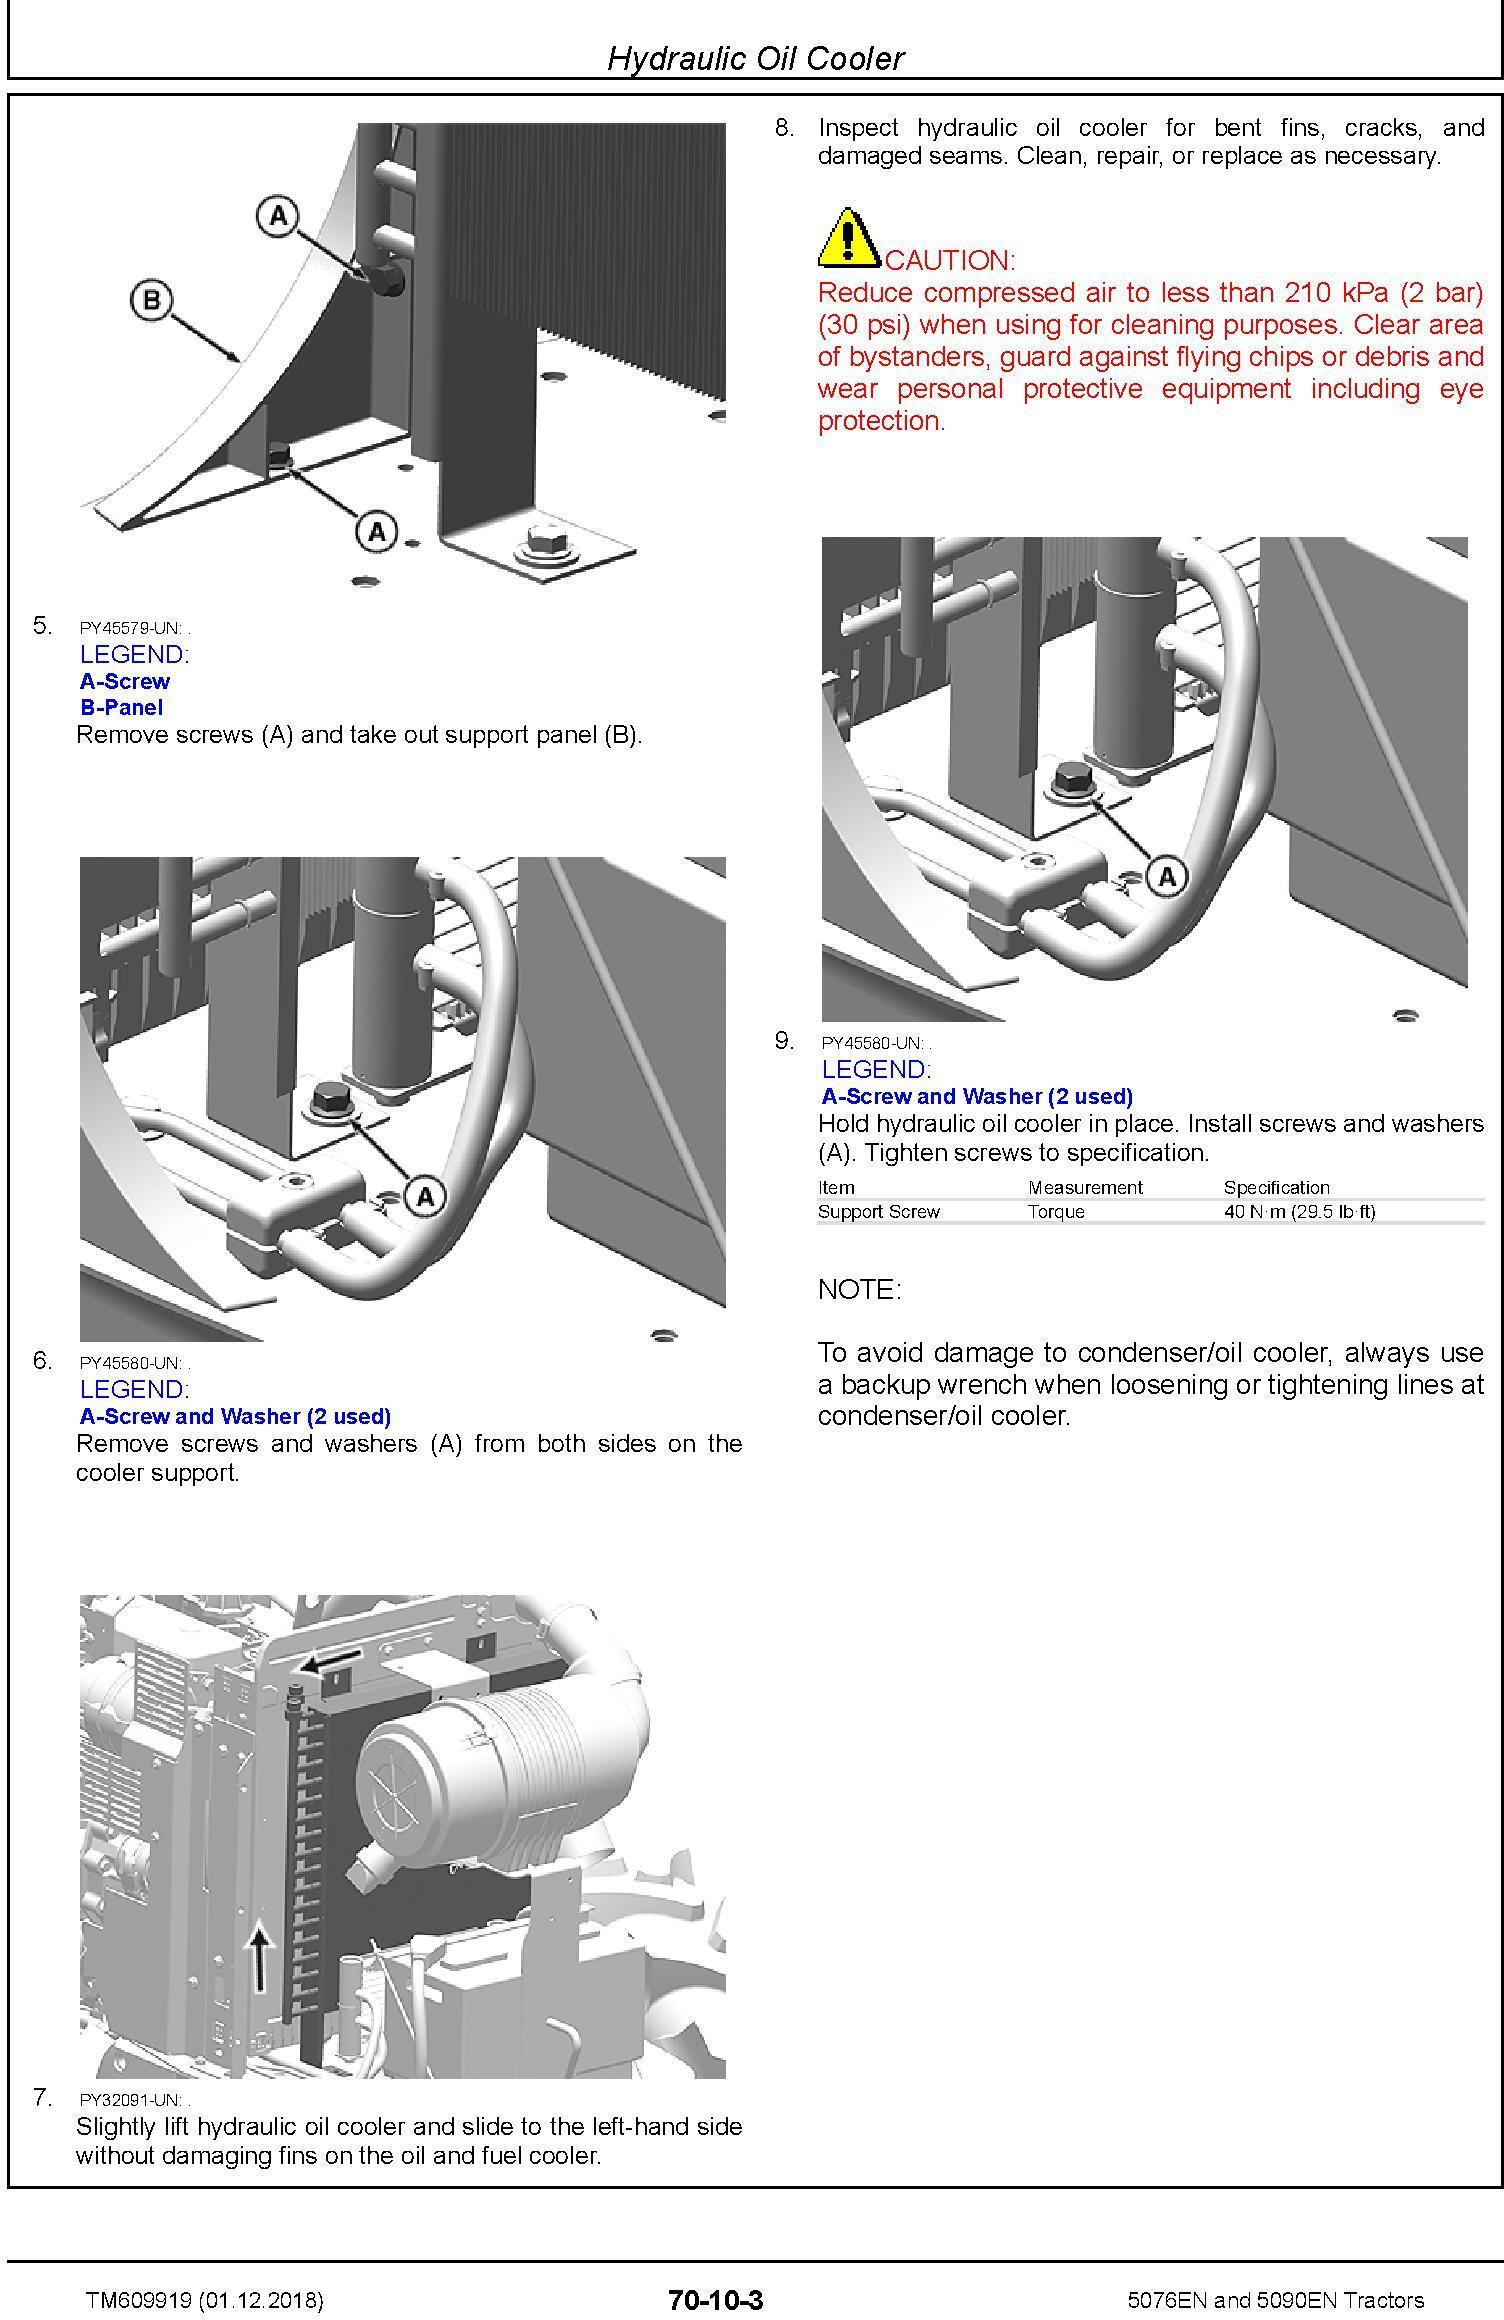 John Deere 5076EN and 5090EN Tractors Repair Technical Service Manual (TM609919) - 1